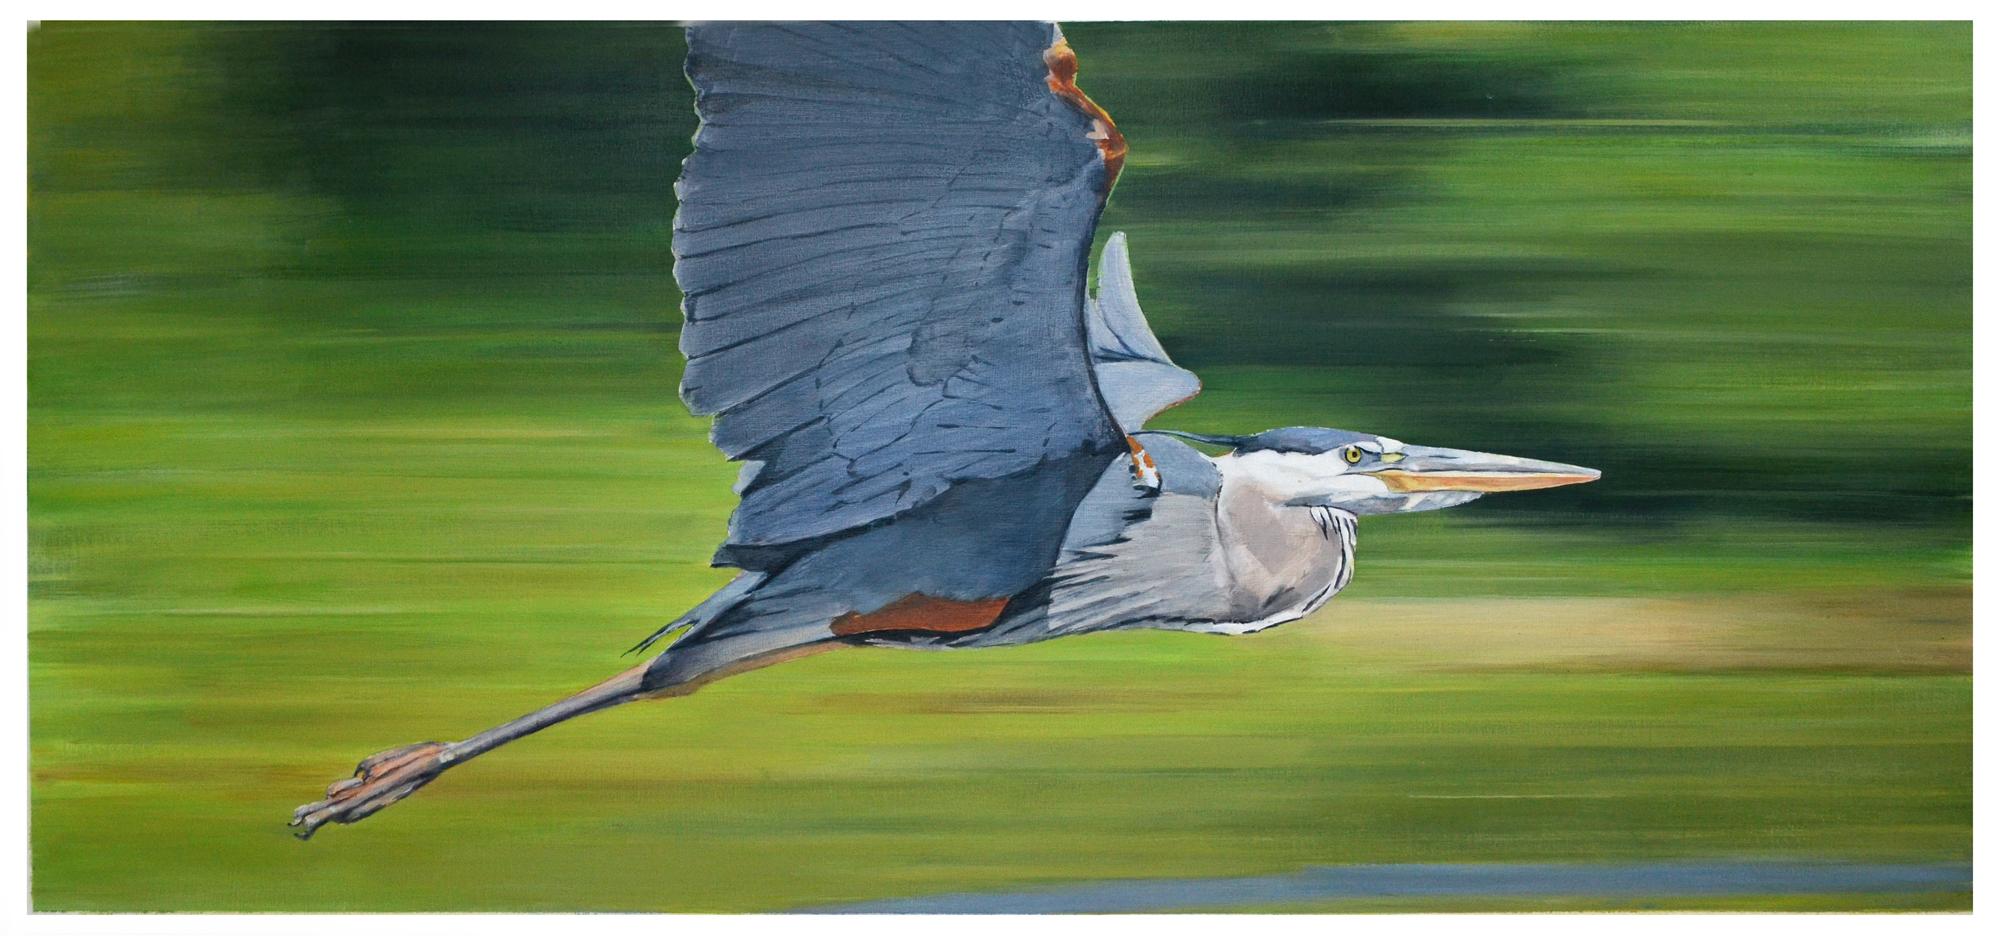 Bird in Flight - Great Blue Heron